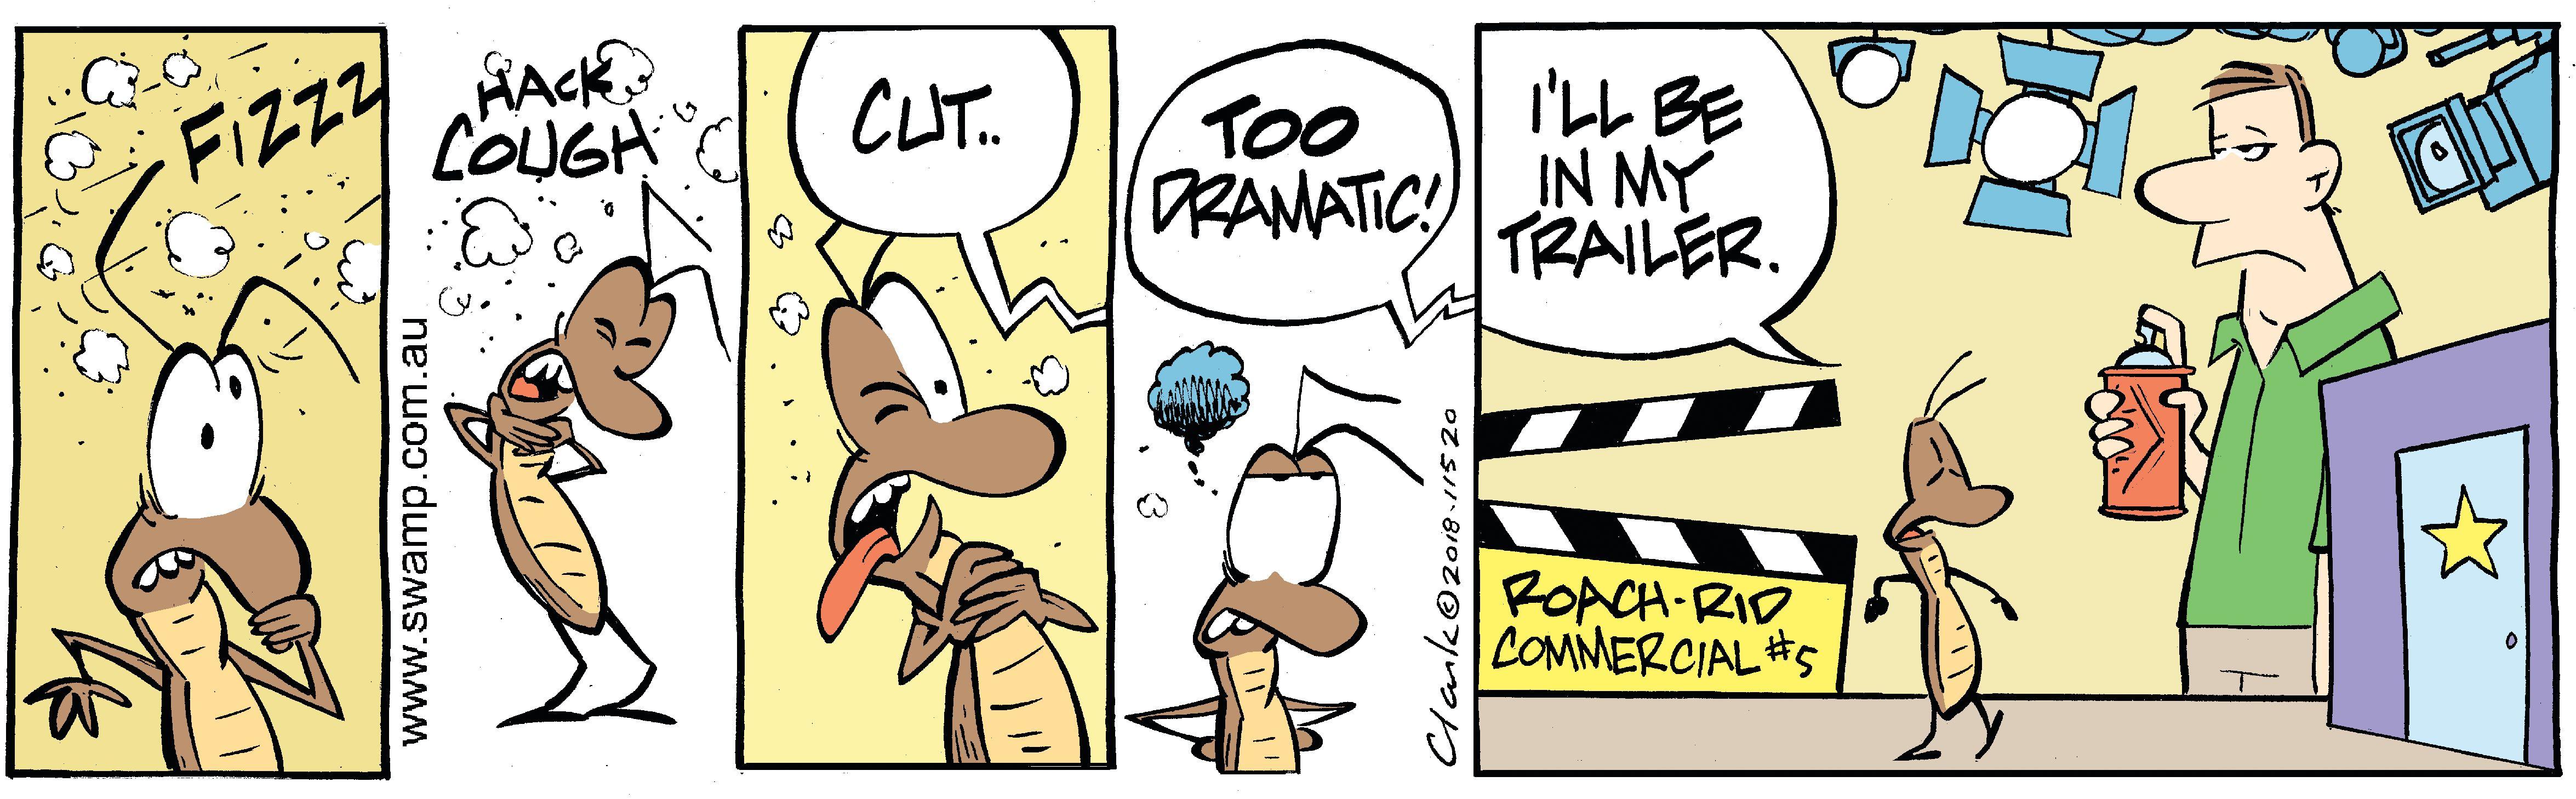 Swamp Cockroach Drama Comic